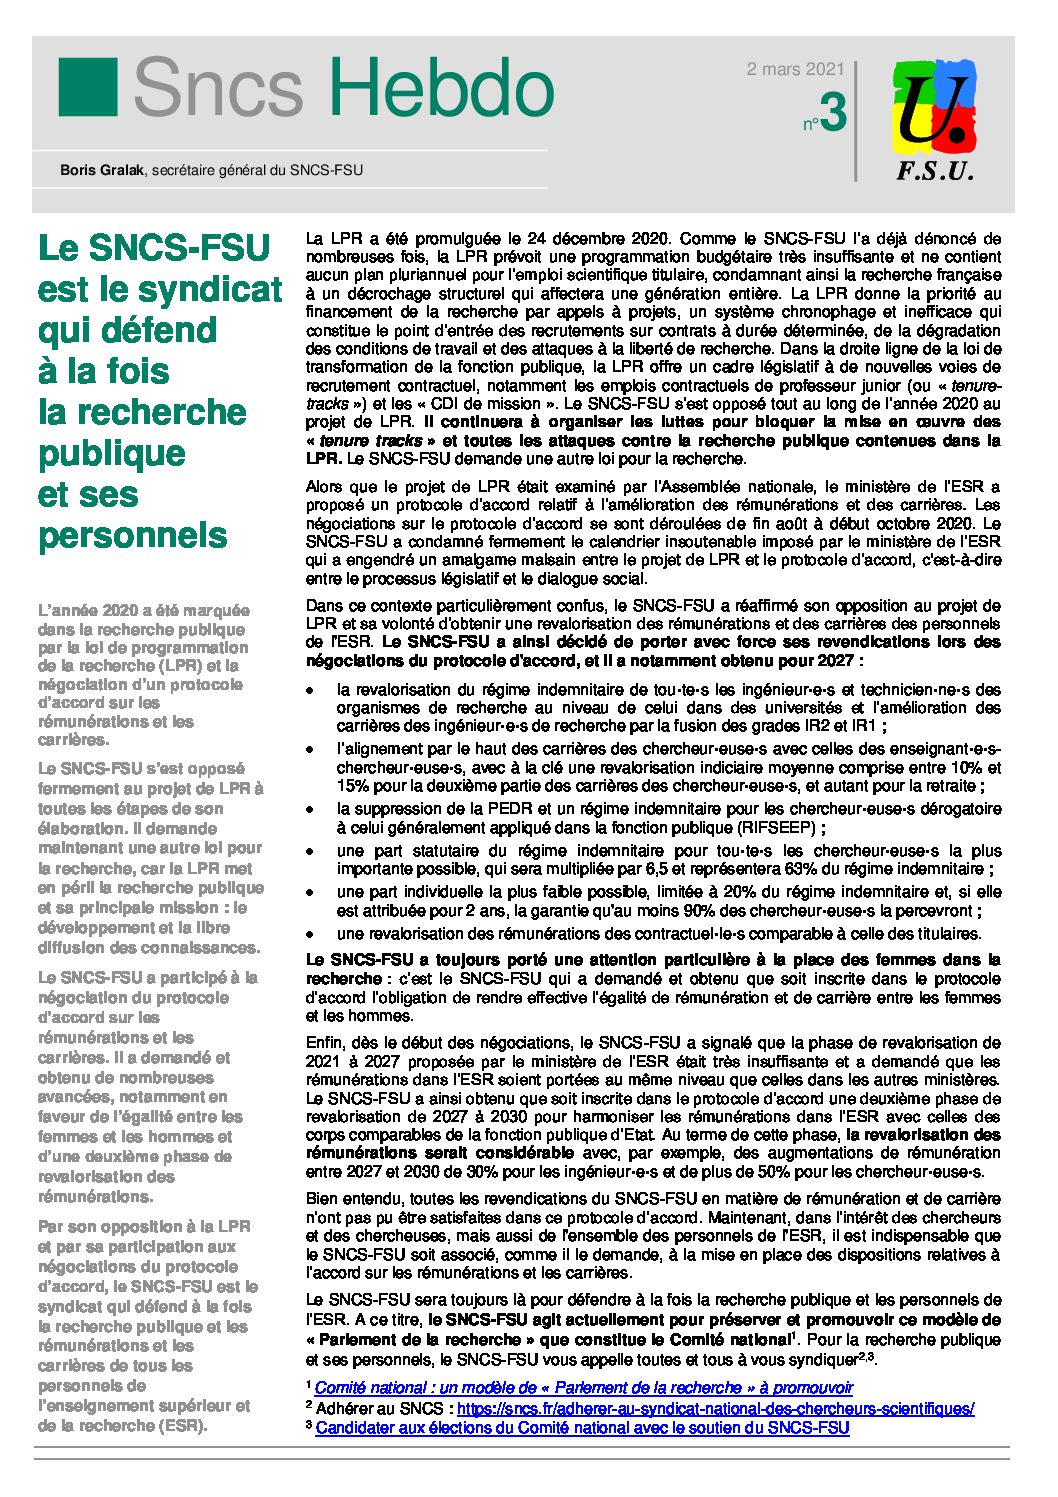 SNCSHebdo21N°3-1-pdf.jpg